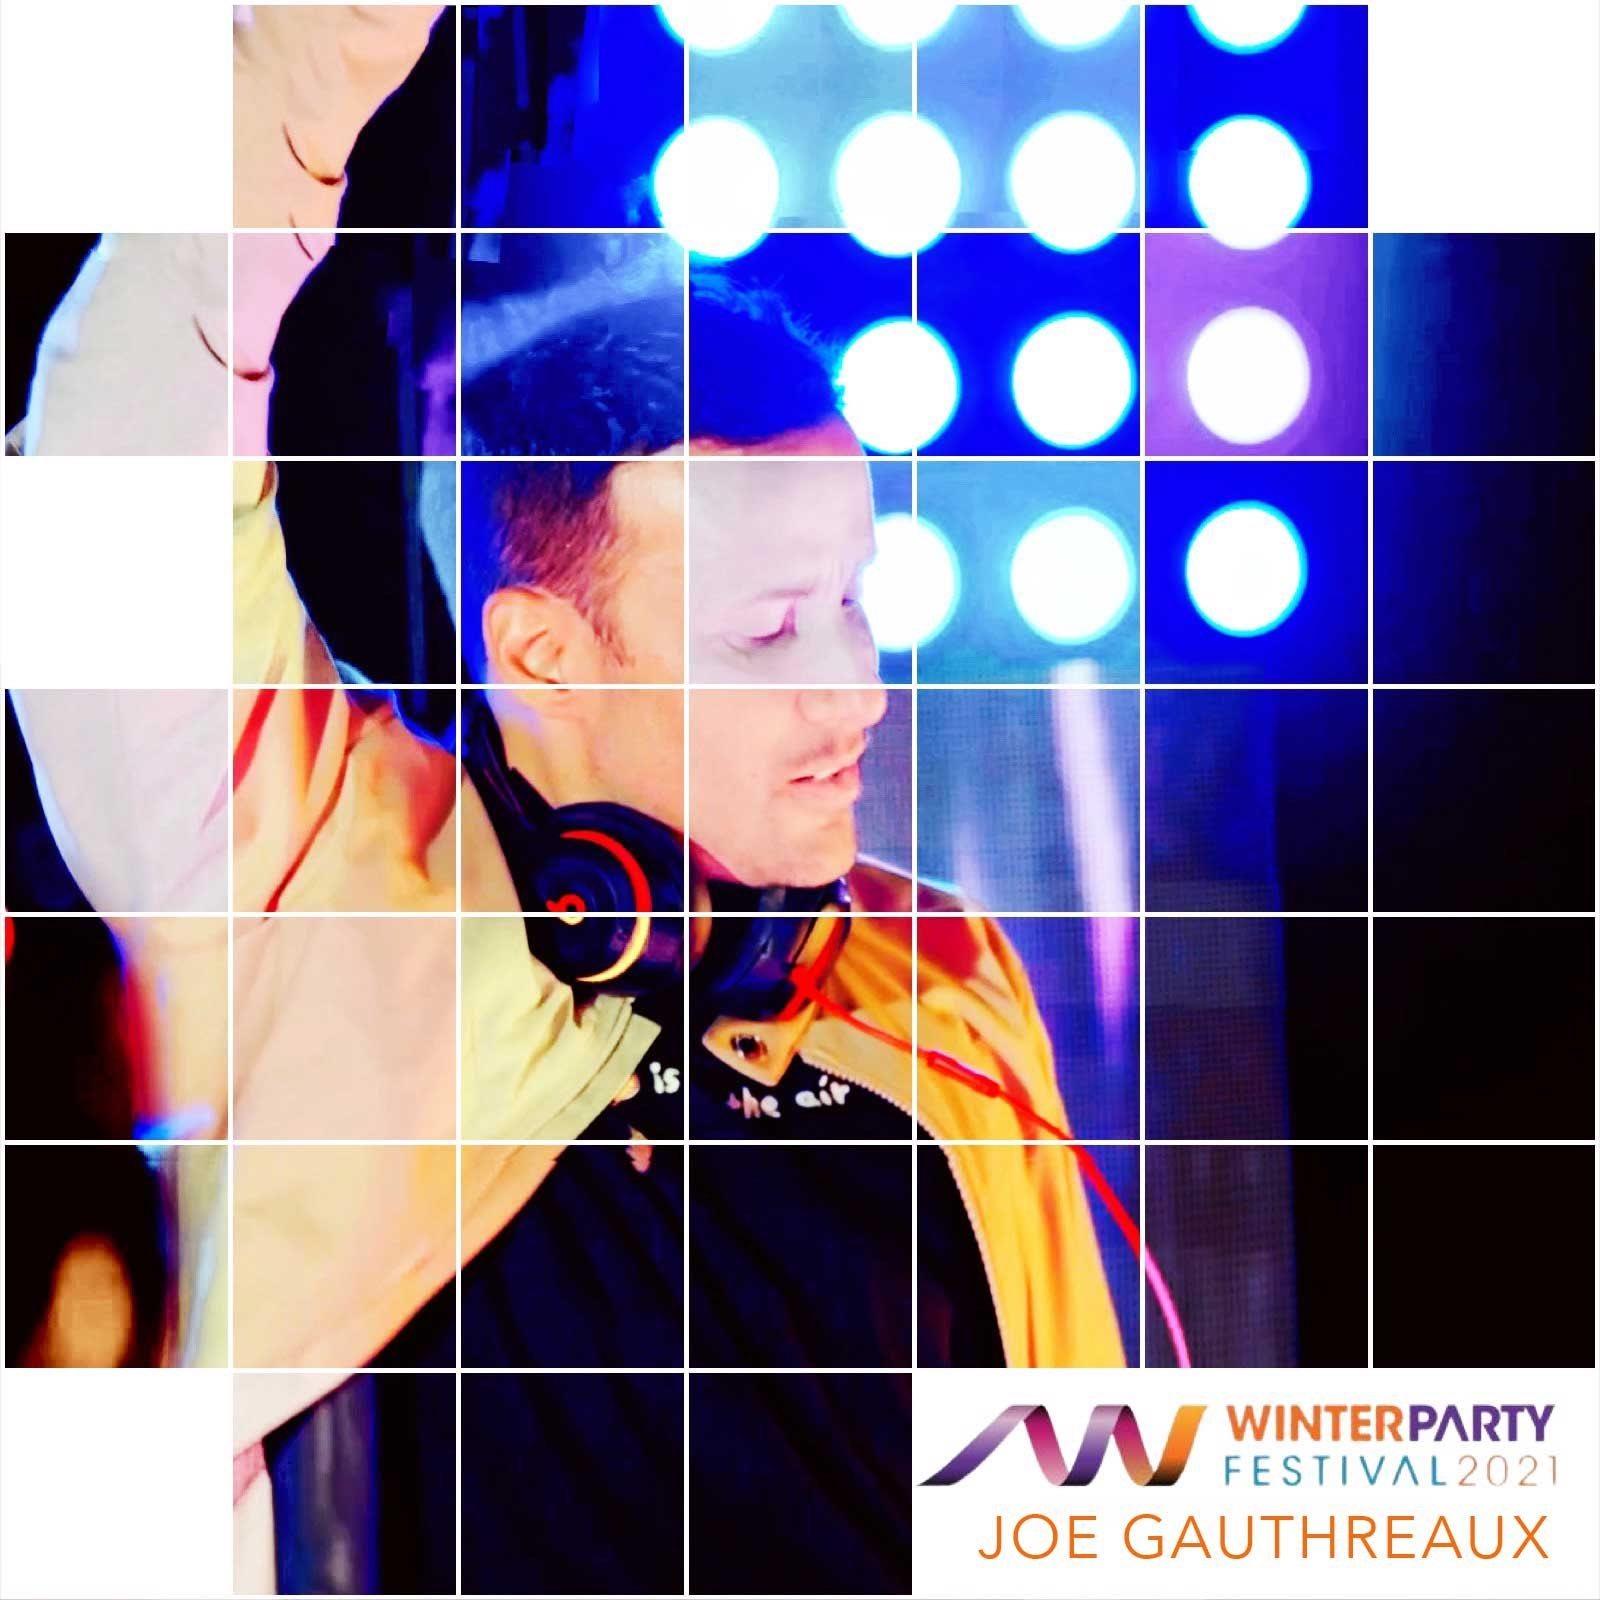 WINTER PARTY LIVESTREAM 2021 - Joe Gauthreaux's Podcast